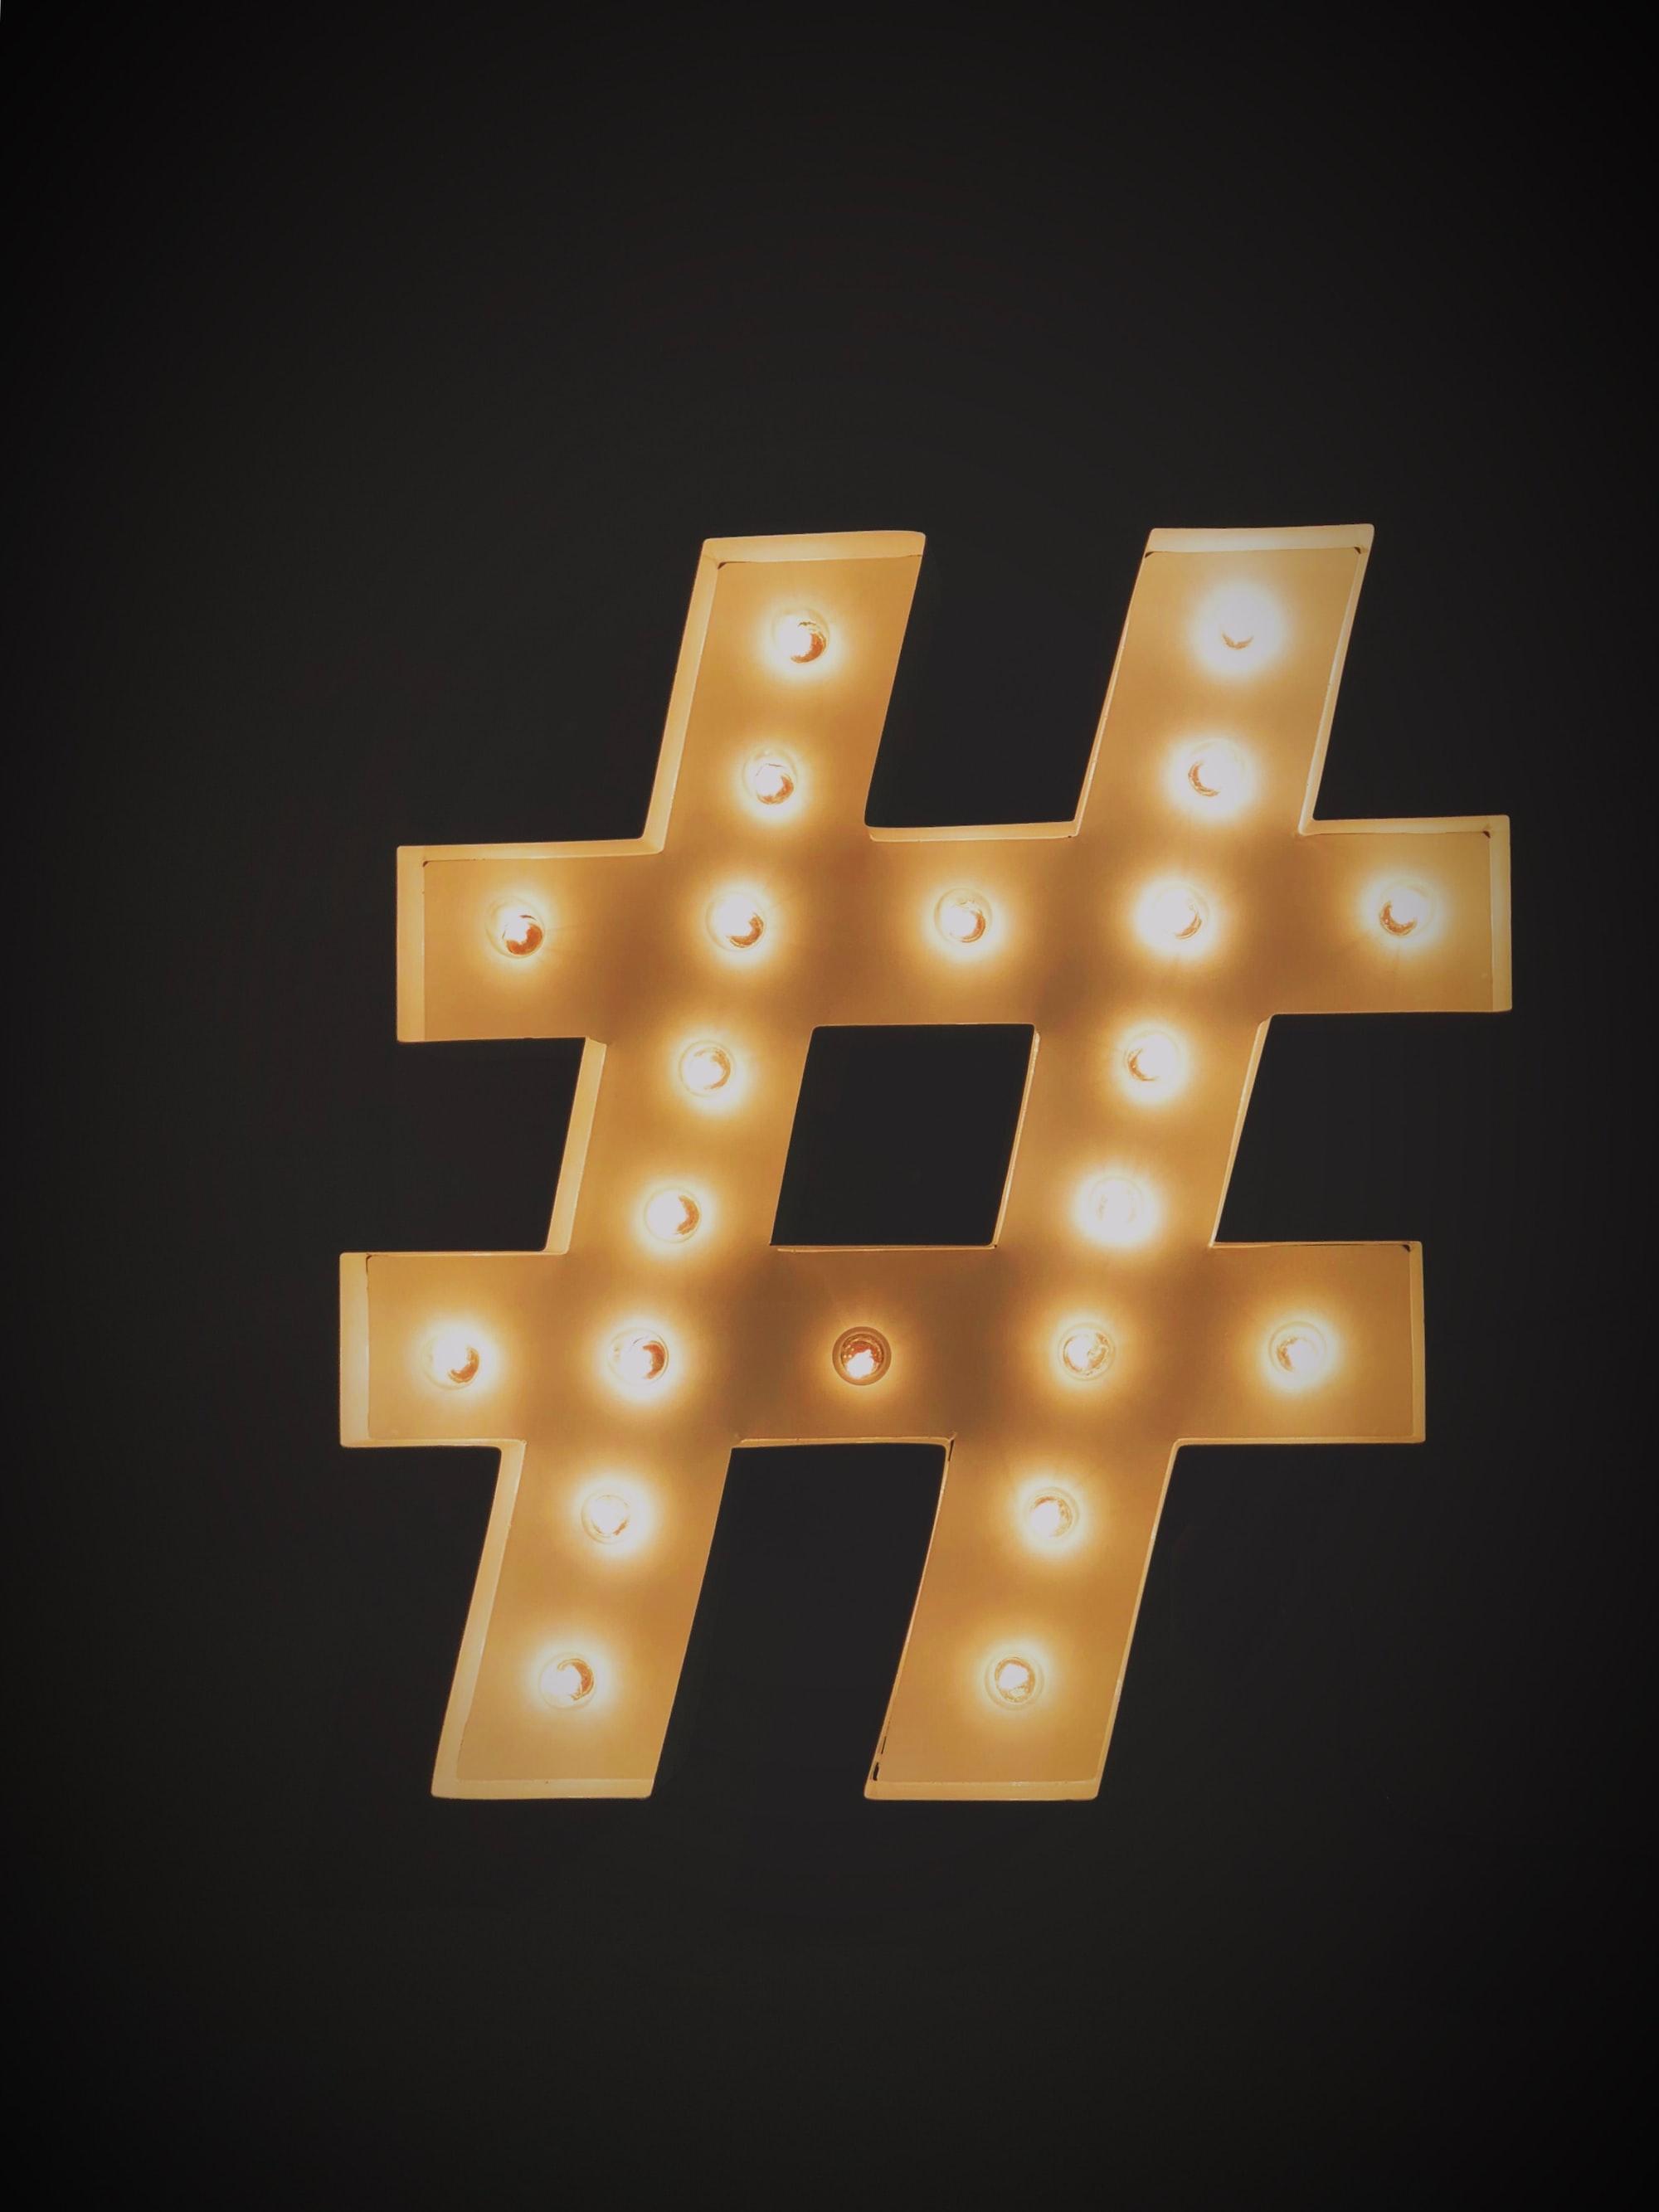 social-media-hashtag